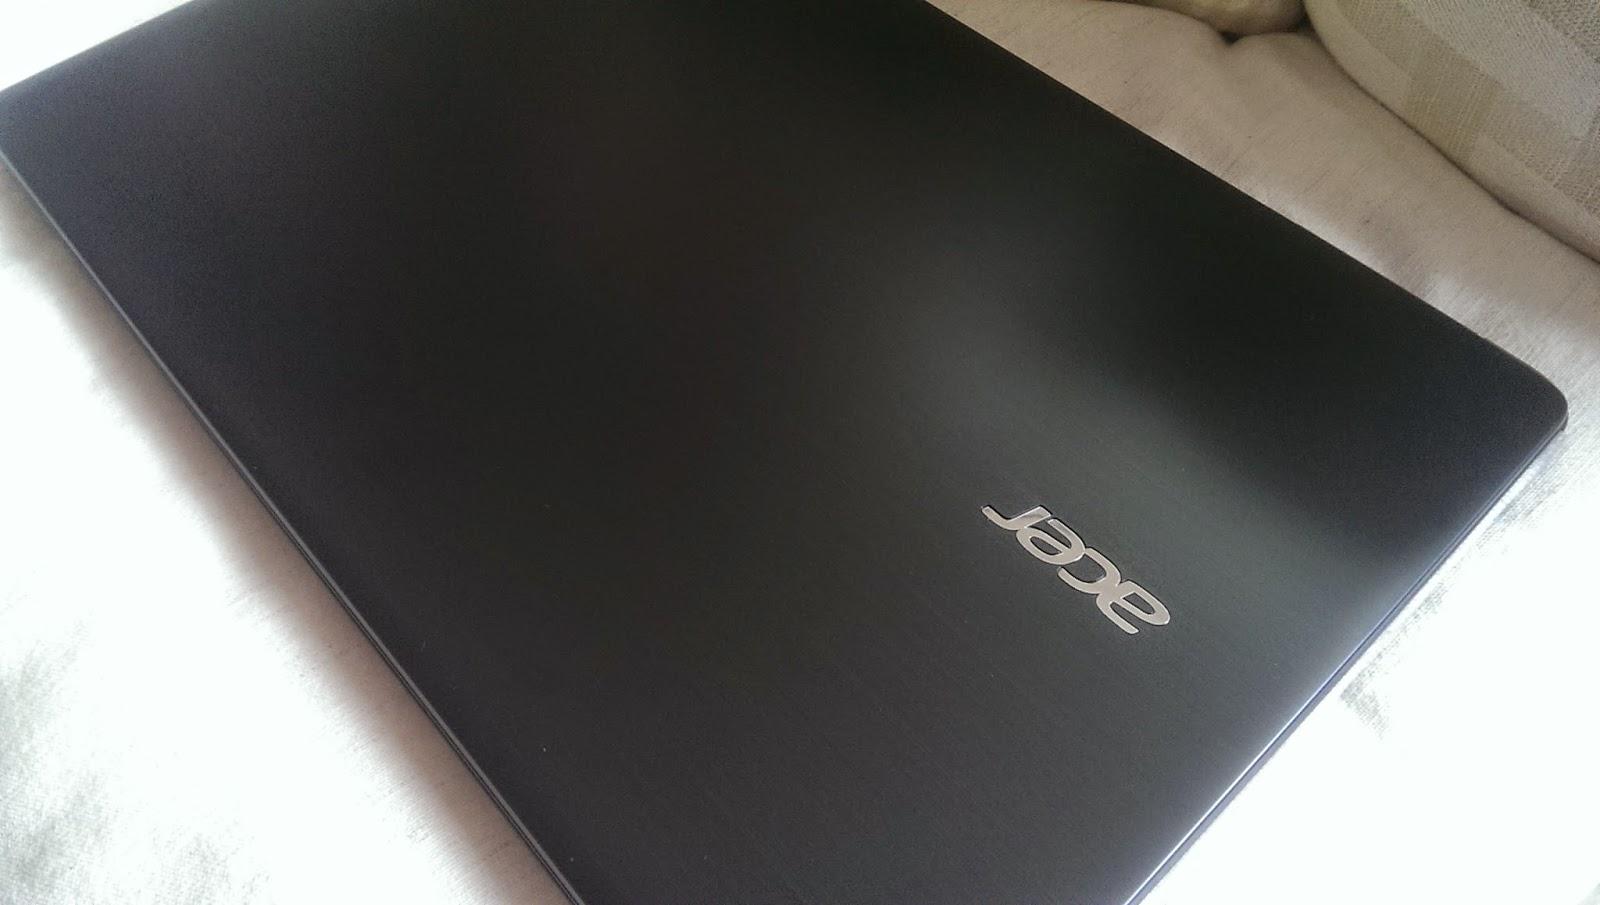 2015 03 22%2B12.13.01 - [開箱] Acer E5-572G i5-4210M 搭配NVIDIA 840G 2G獨顯